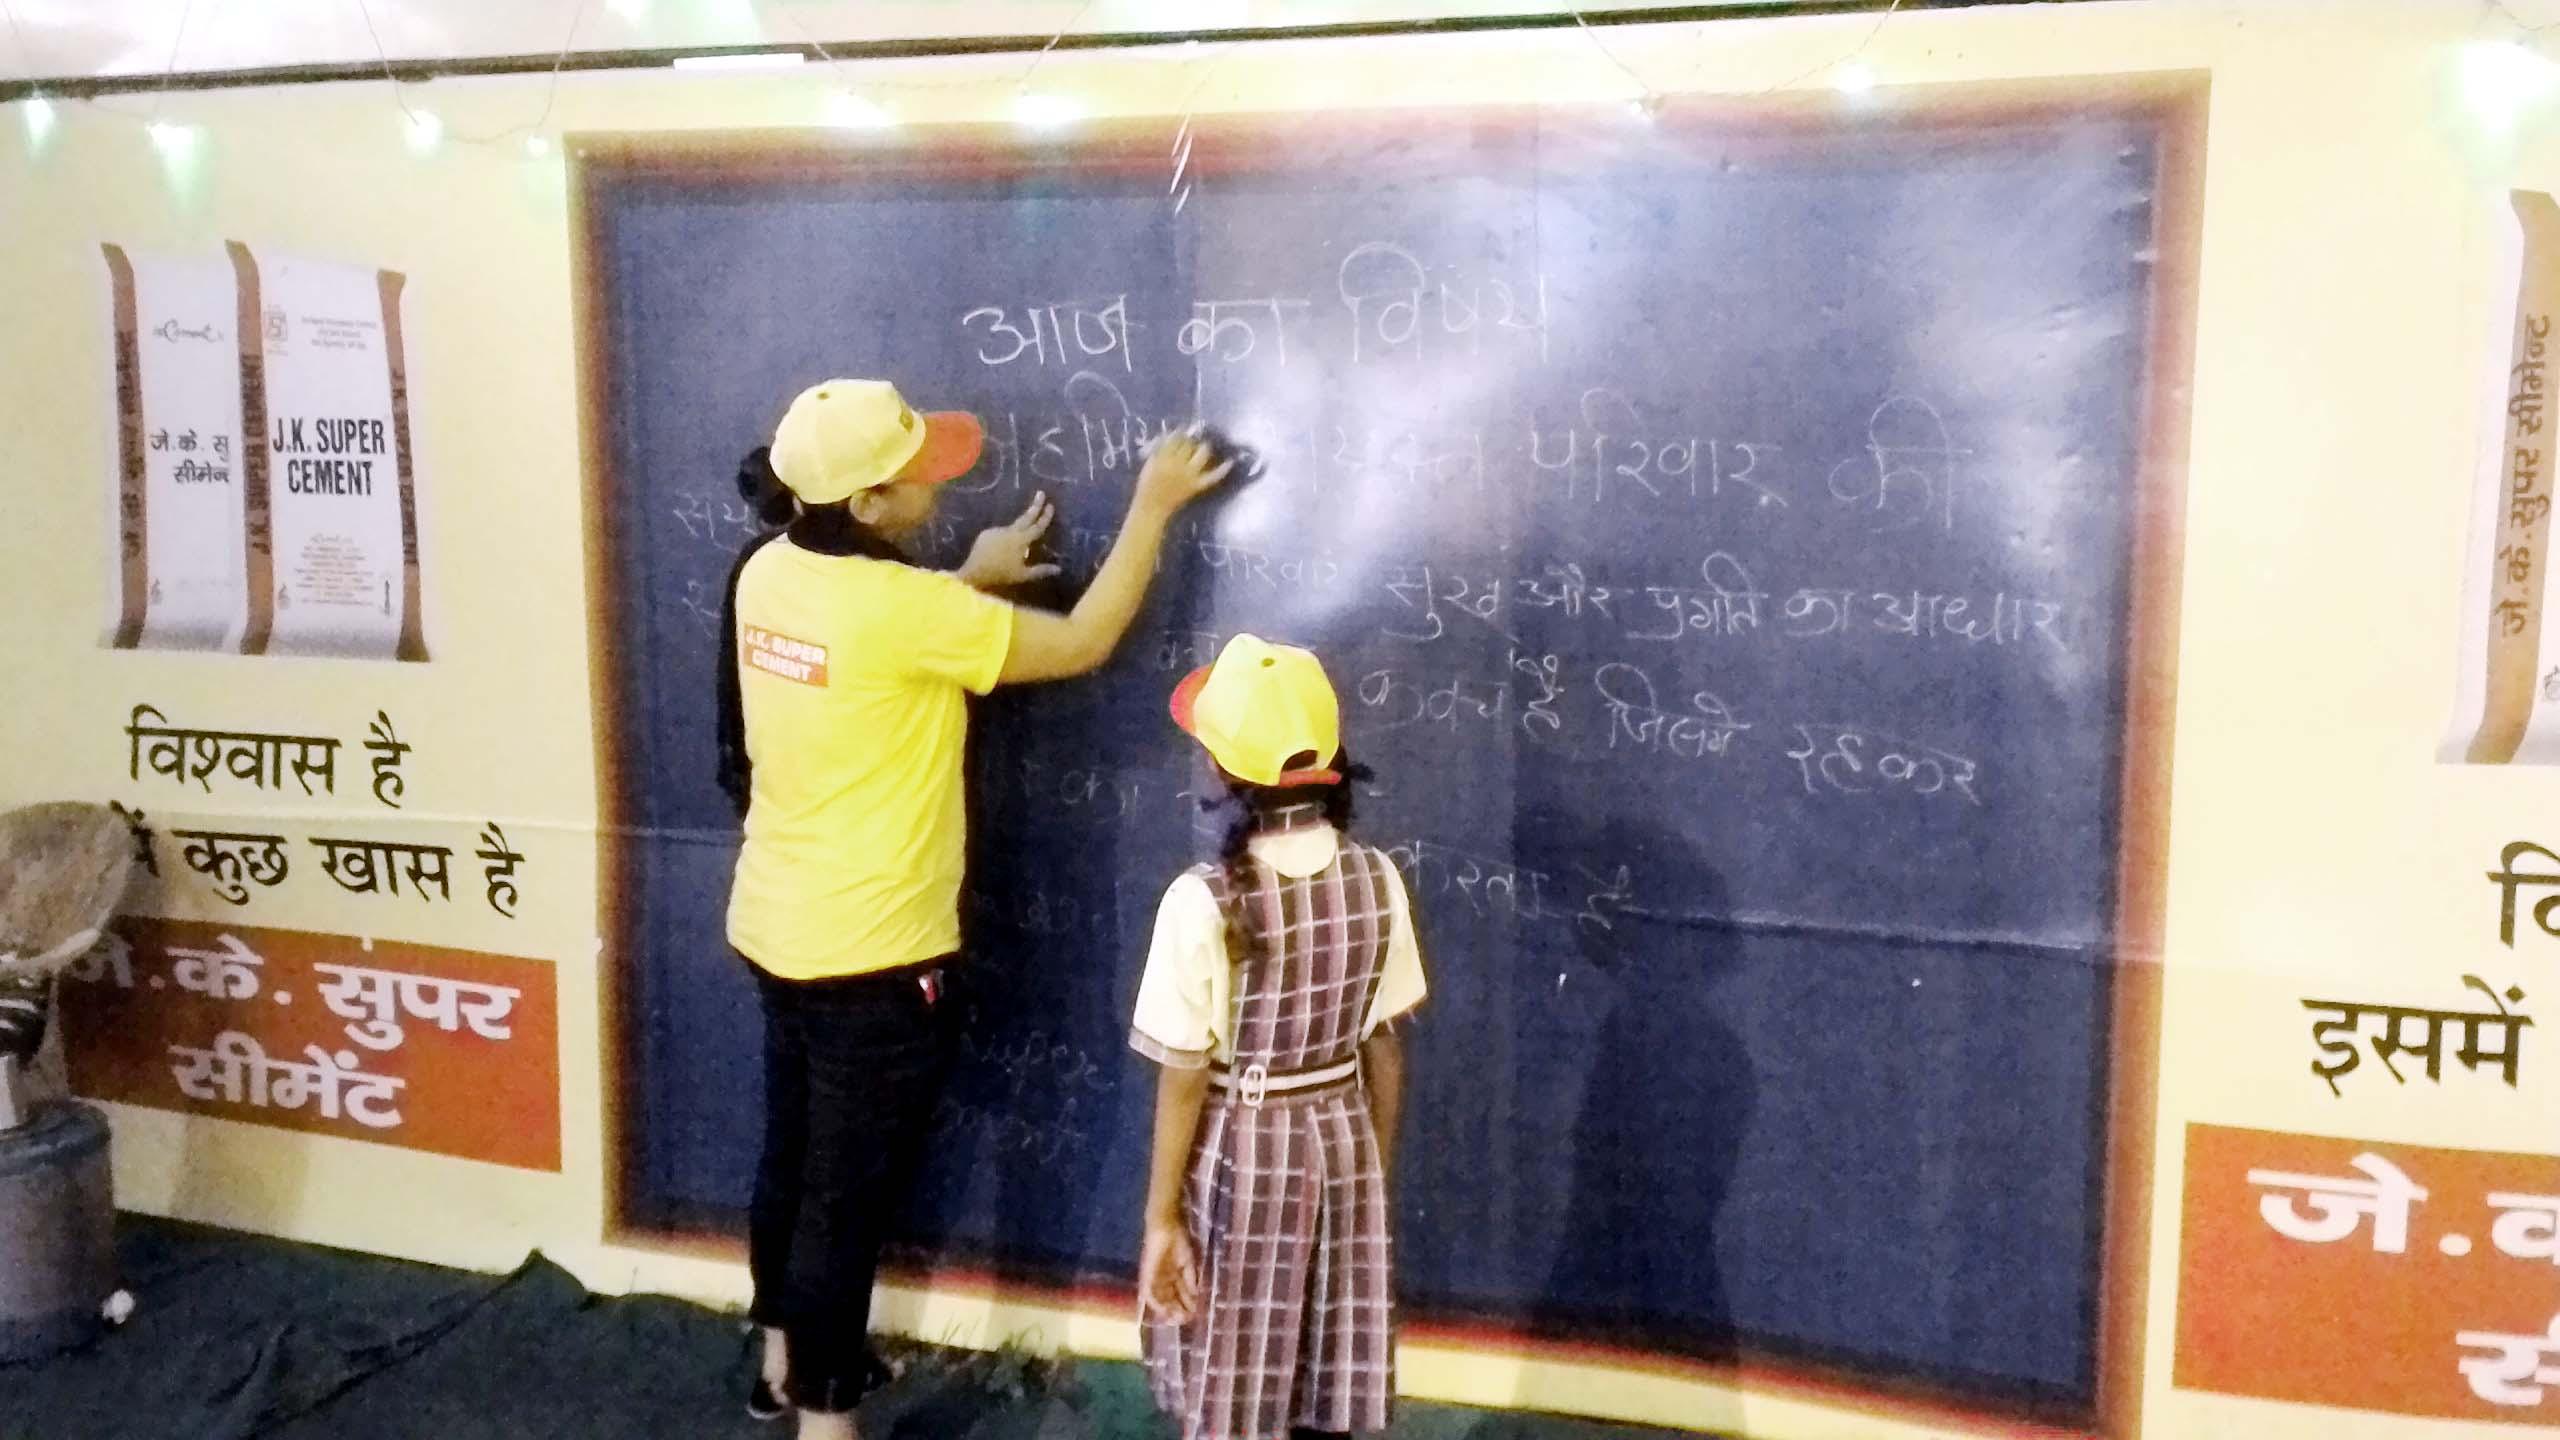 Vritti iMedia Engages 23,000 Kids for JK Cement at Diggi Padyatra in Rajasthan